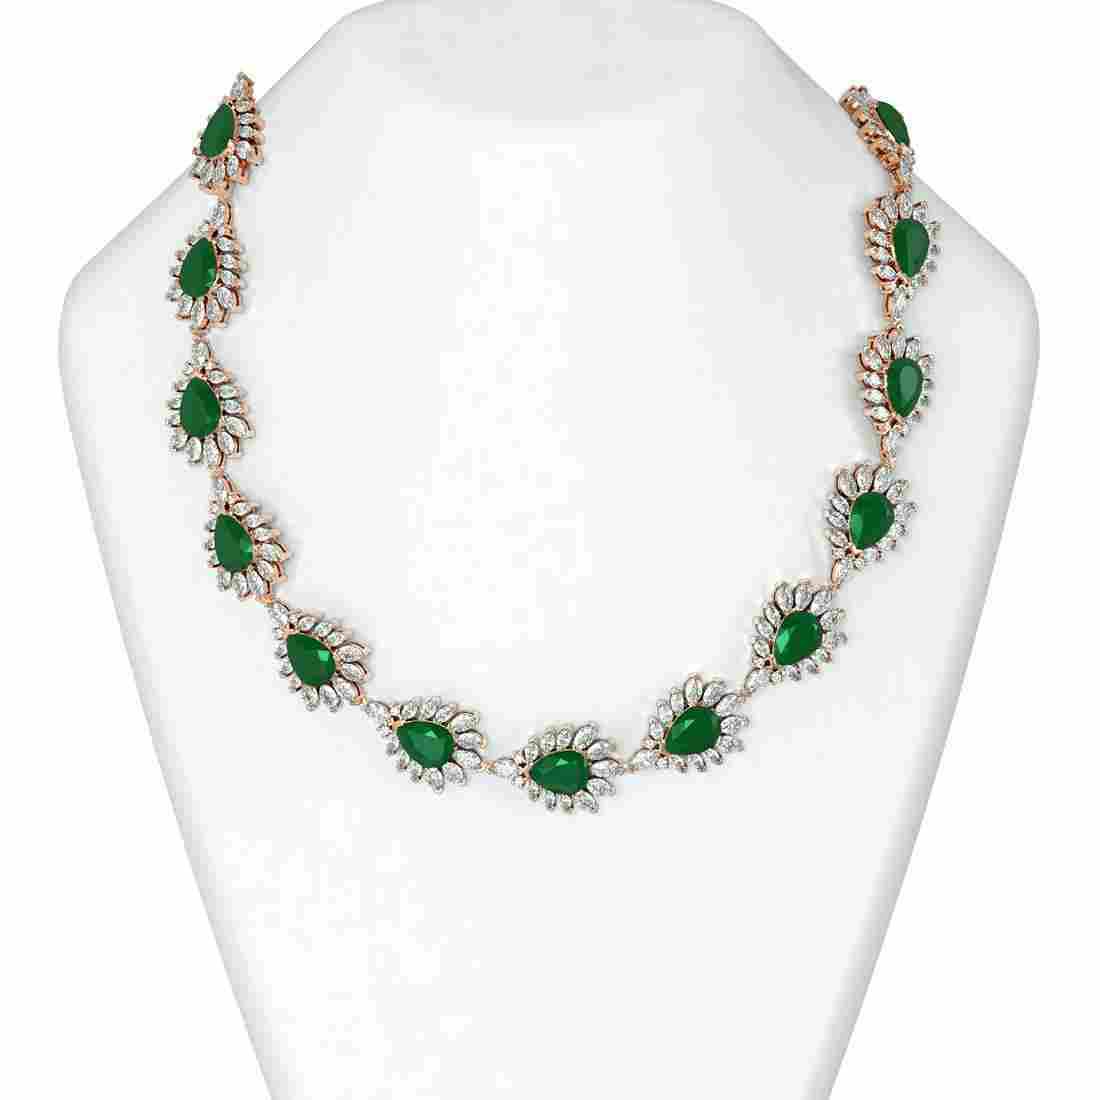 112.52 ctw Emerald & Diamond Necklace 18K Rose Gold -